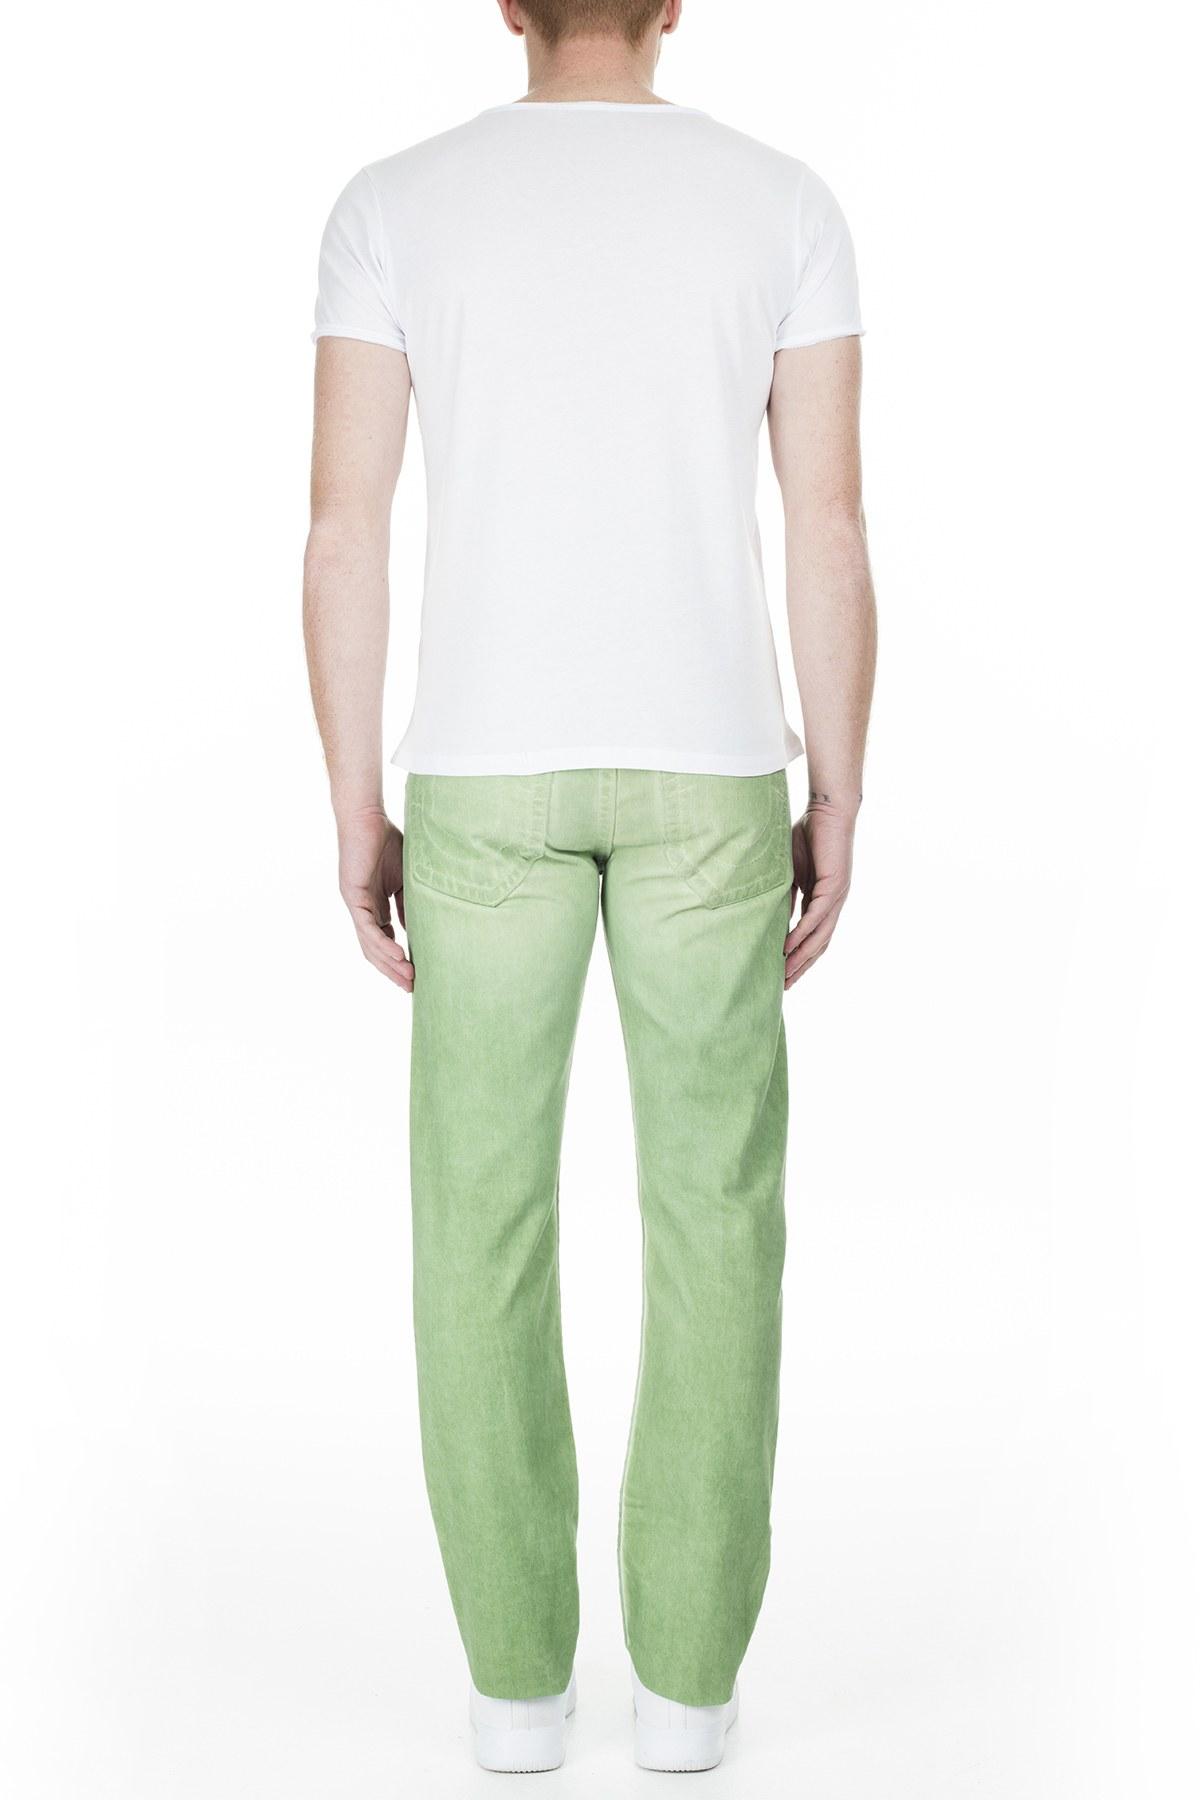 True Religion Jeans Erkek Kot Pantolon M58J19Y13 YEŞİL